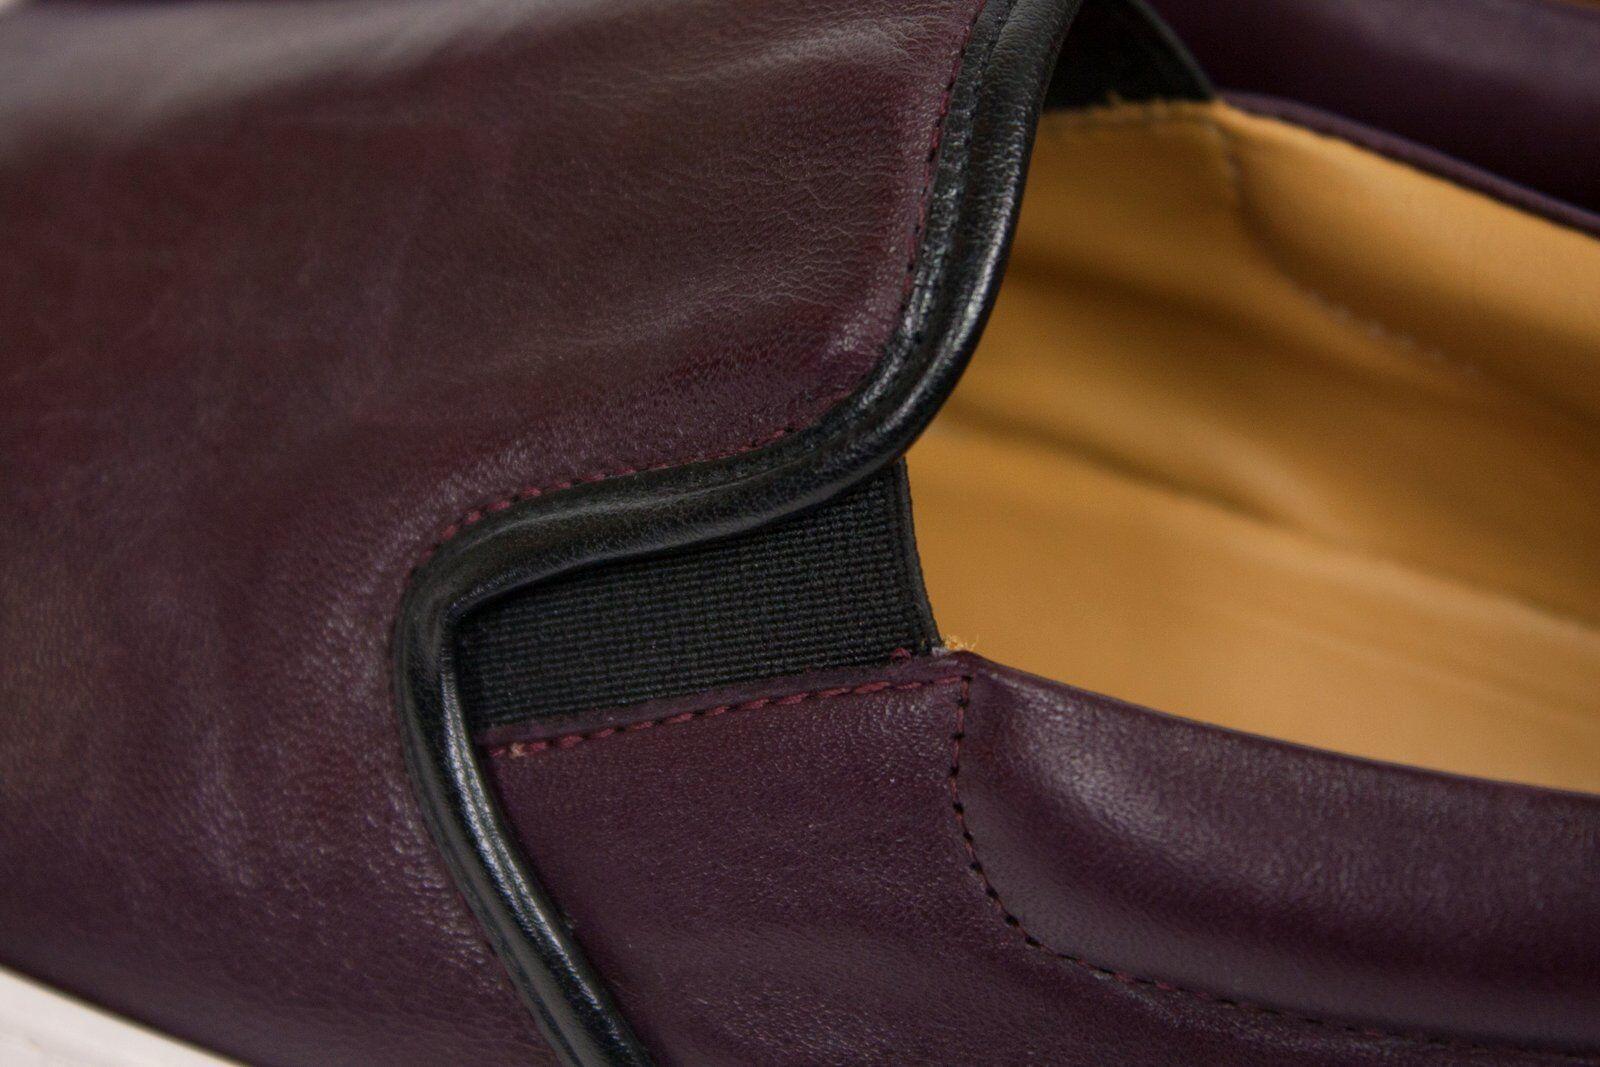 FABIO RUSCONI donna Deep Burgundy Burgundy Burgundy rosso Genuine Leather Slip On scarpe EU 39  26cf7a